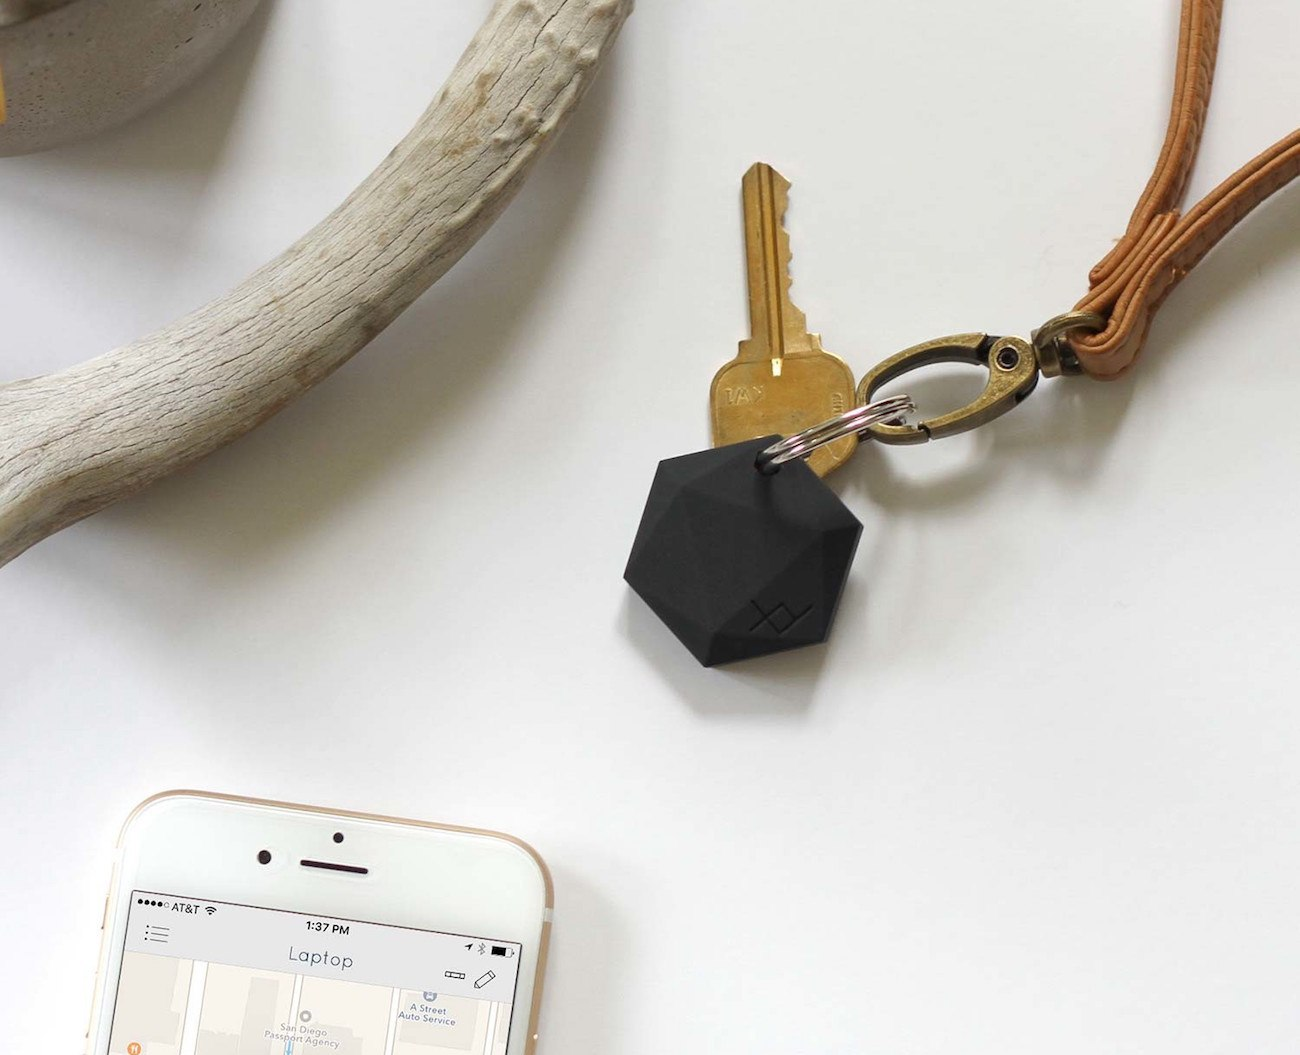 XY3 Bluetooth Item Finder